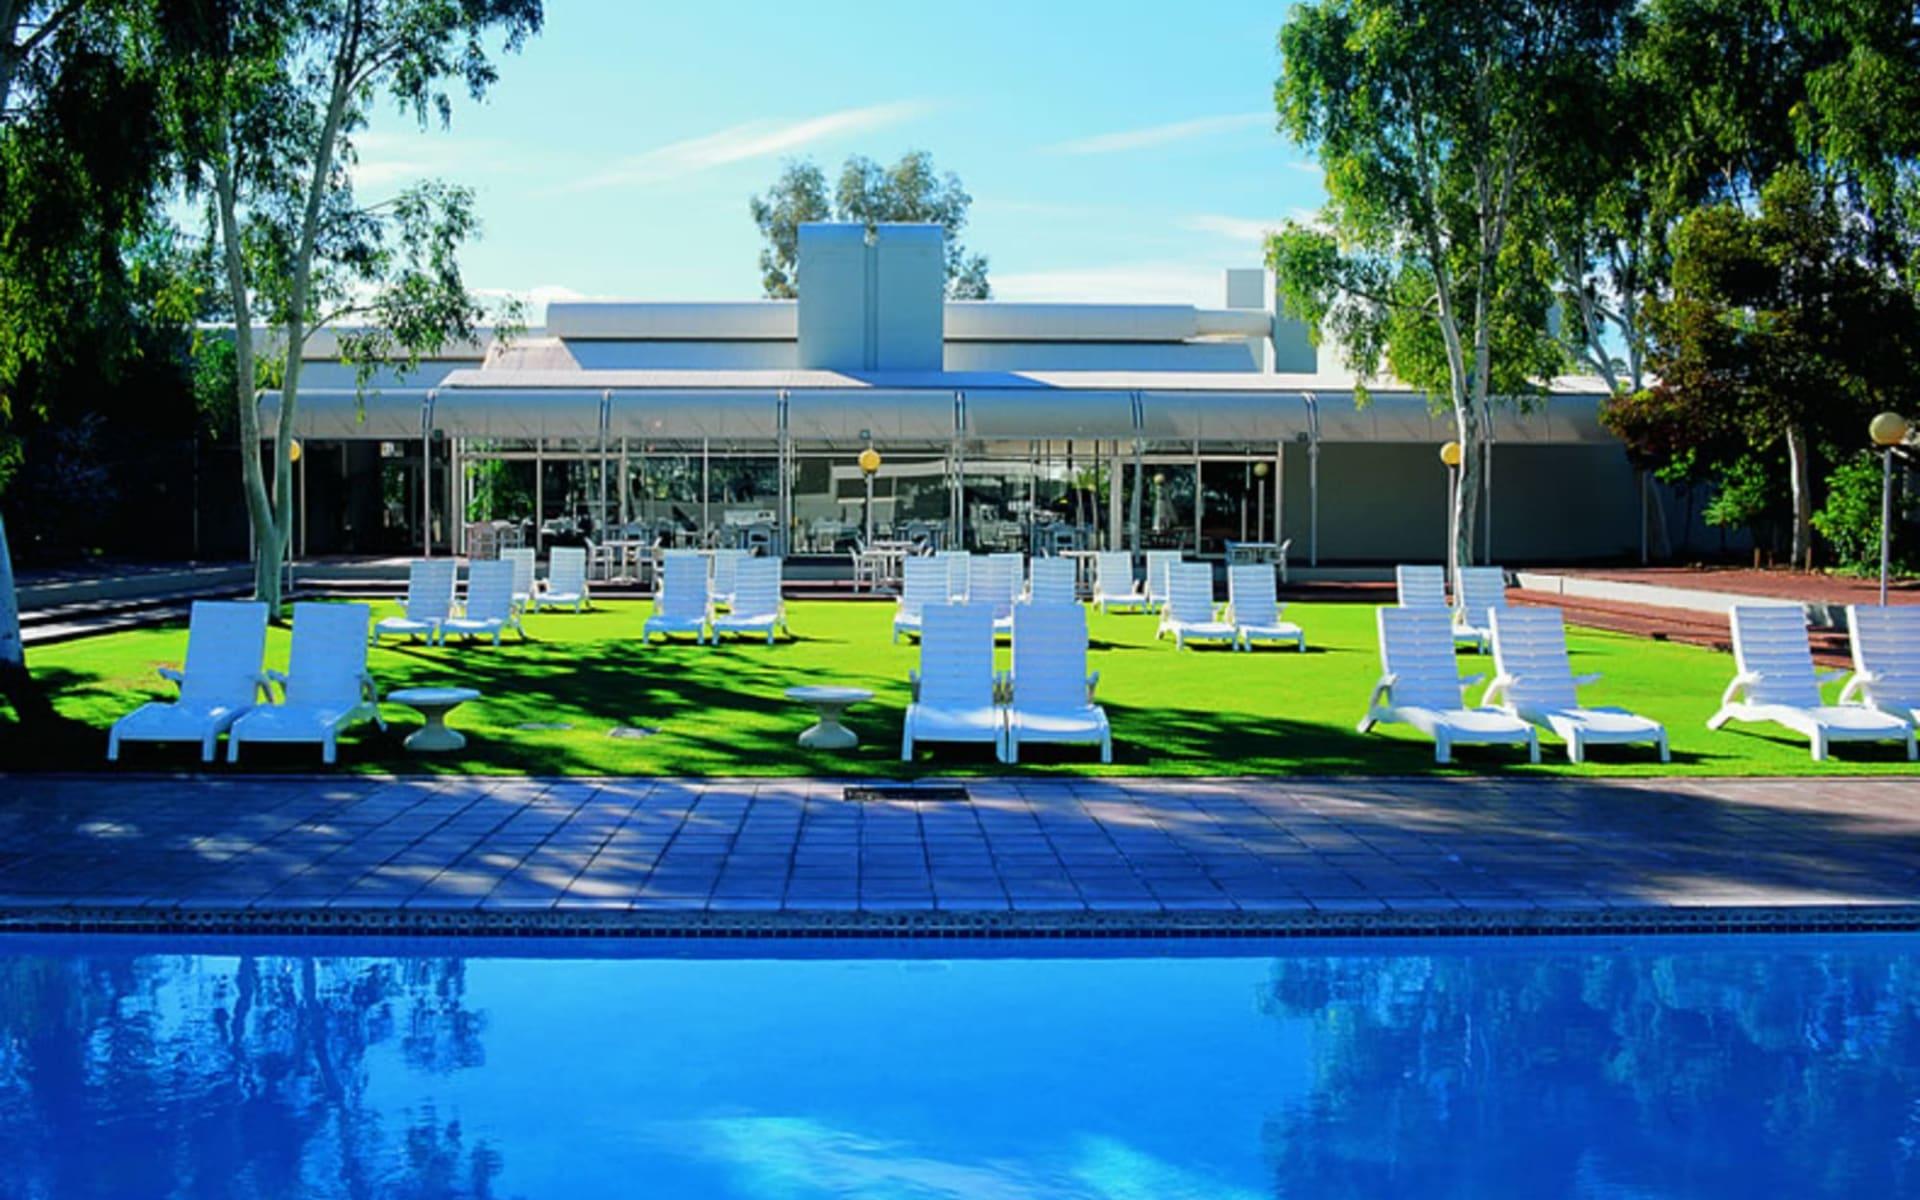 Desert Gardens Hotel in Ayers Rock - Yulara:  Voyages Desert Gardens